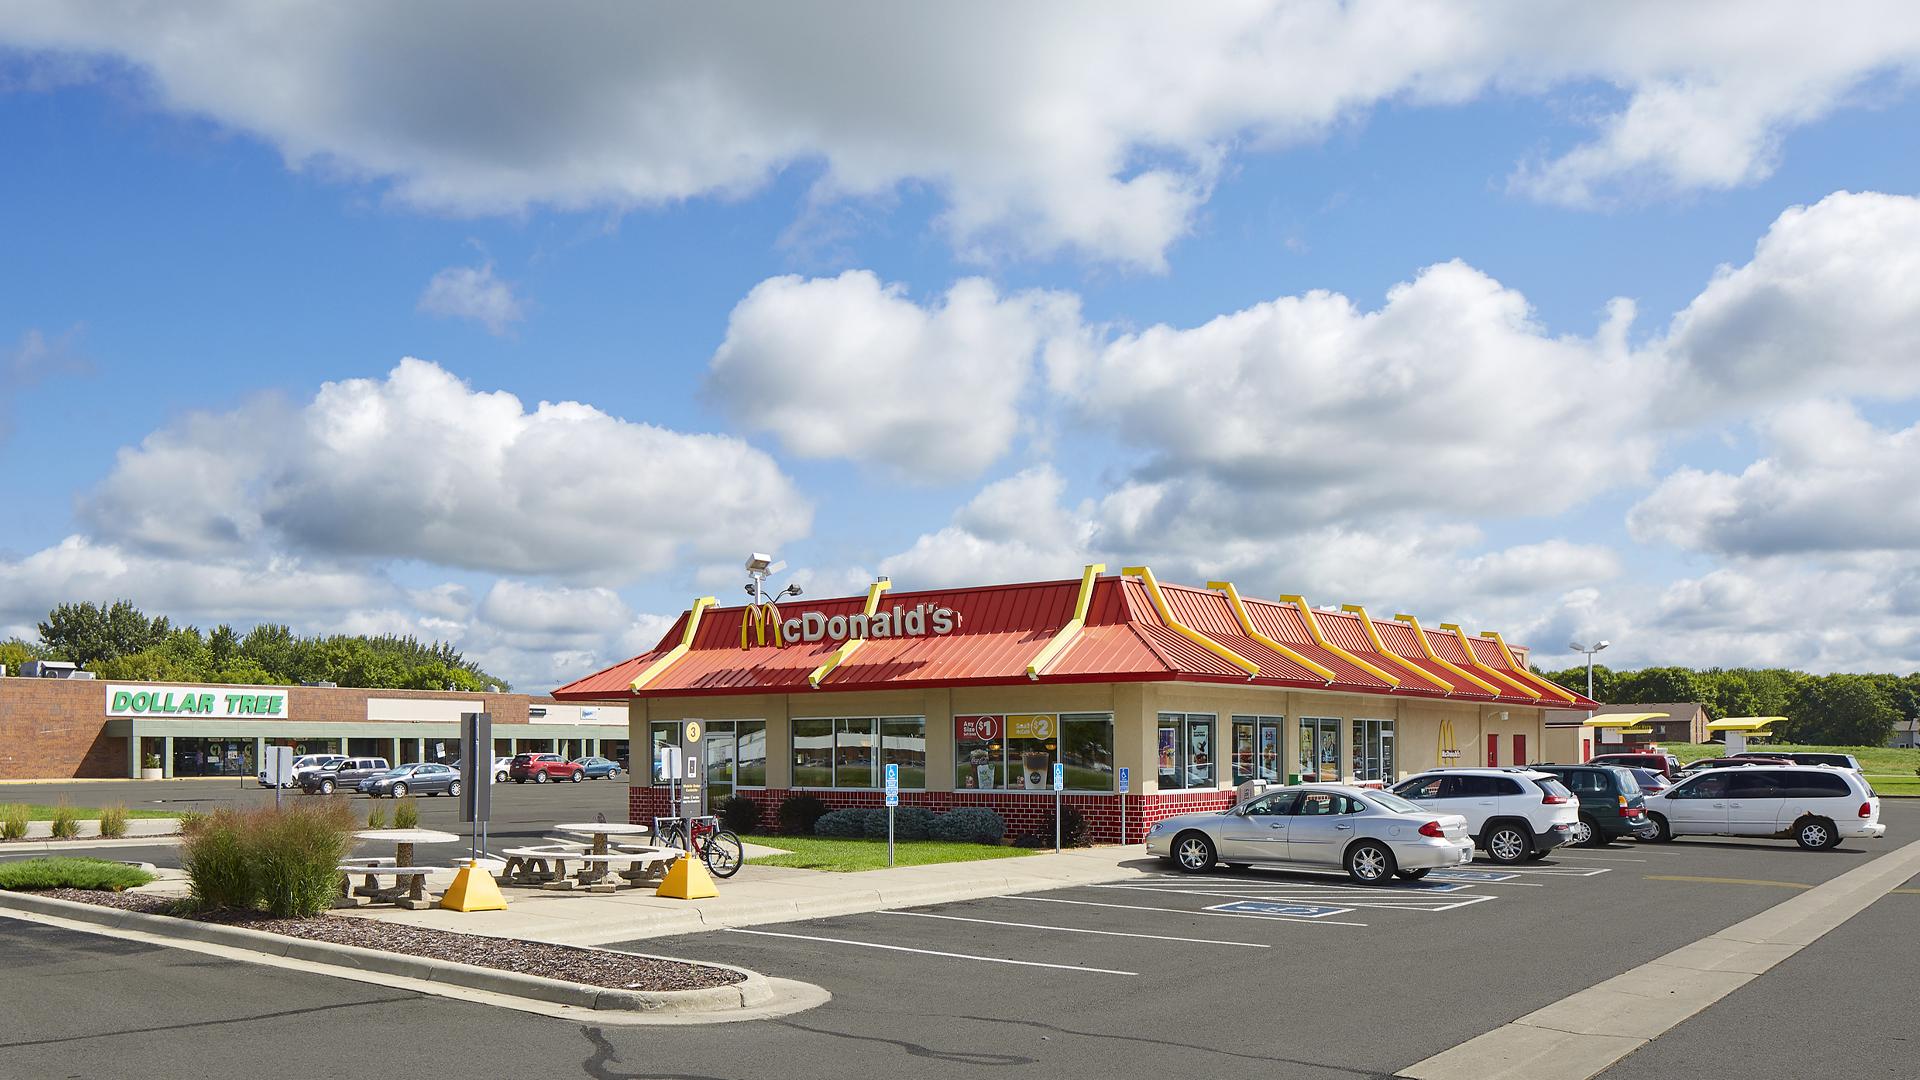 Northridge Plaza Retail Shopping Center Waseca MN exterior featuring McDonalds